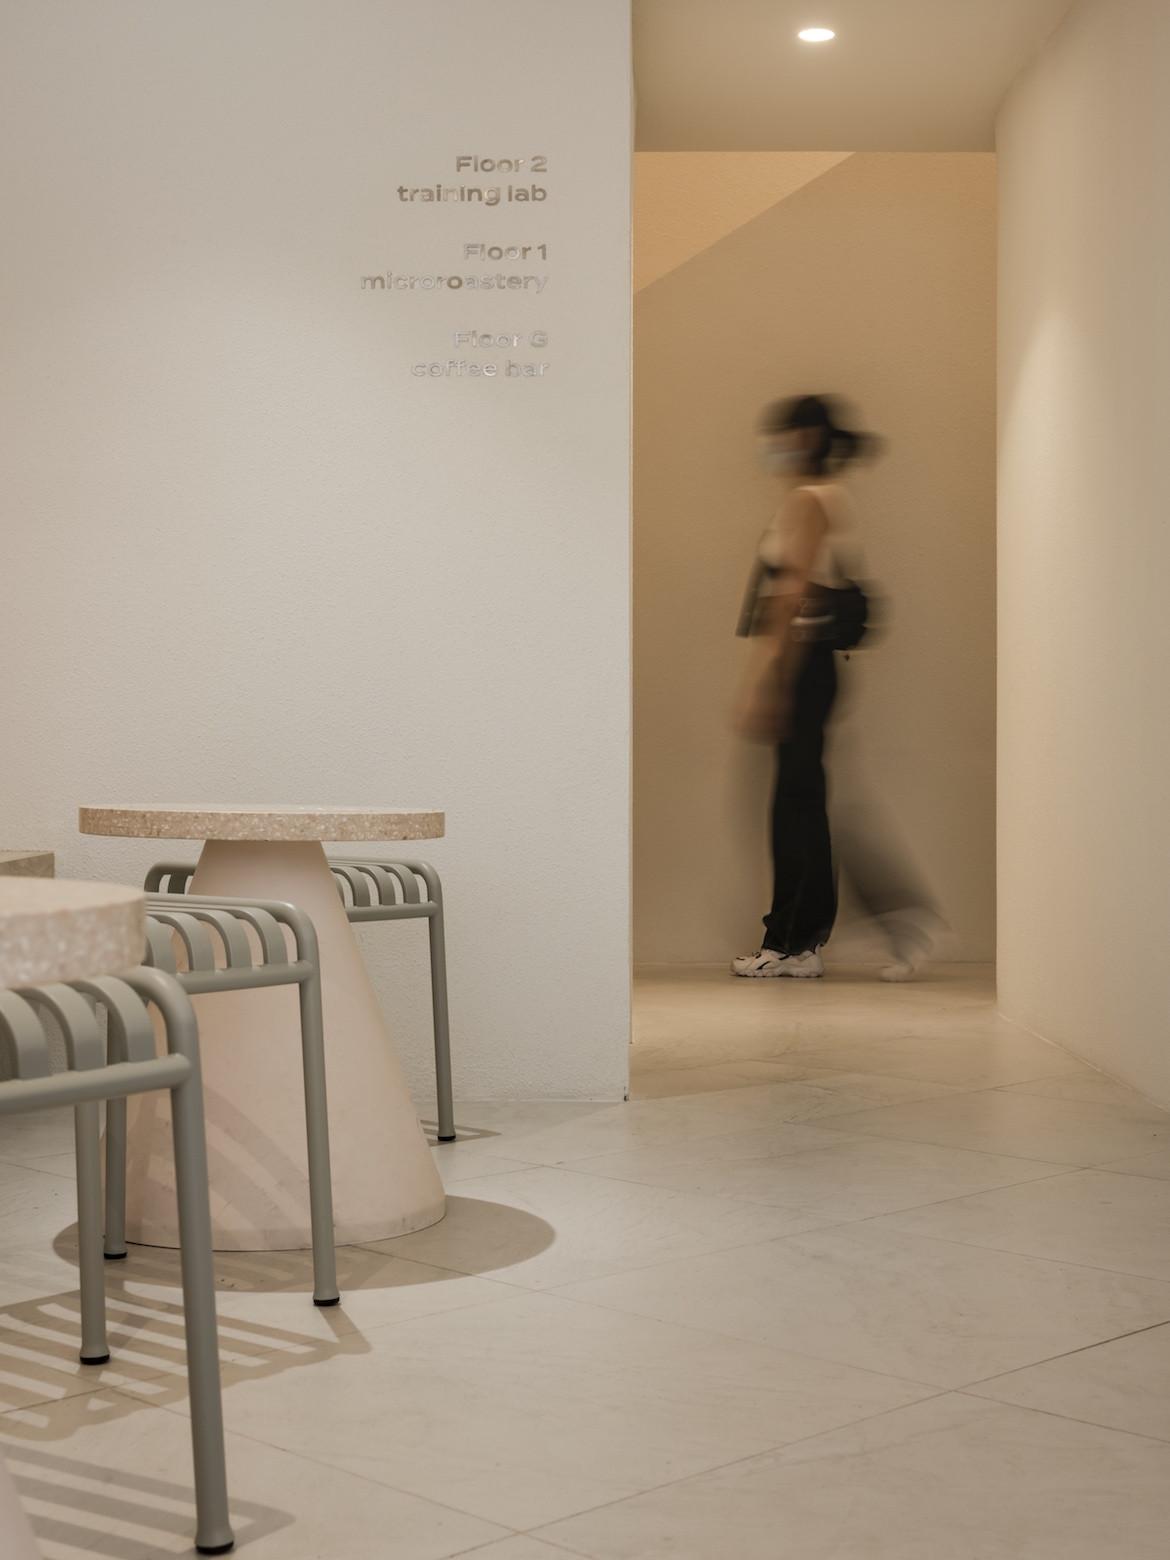 A person walks through a doorway in Exterior of PAGA Microroastery.